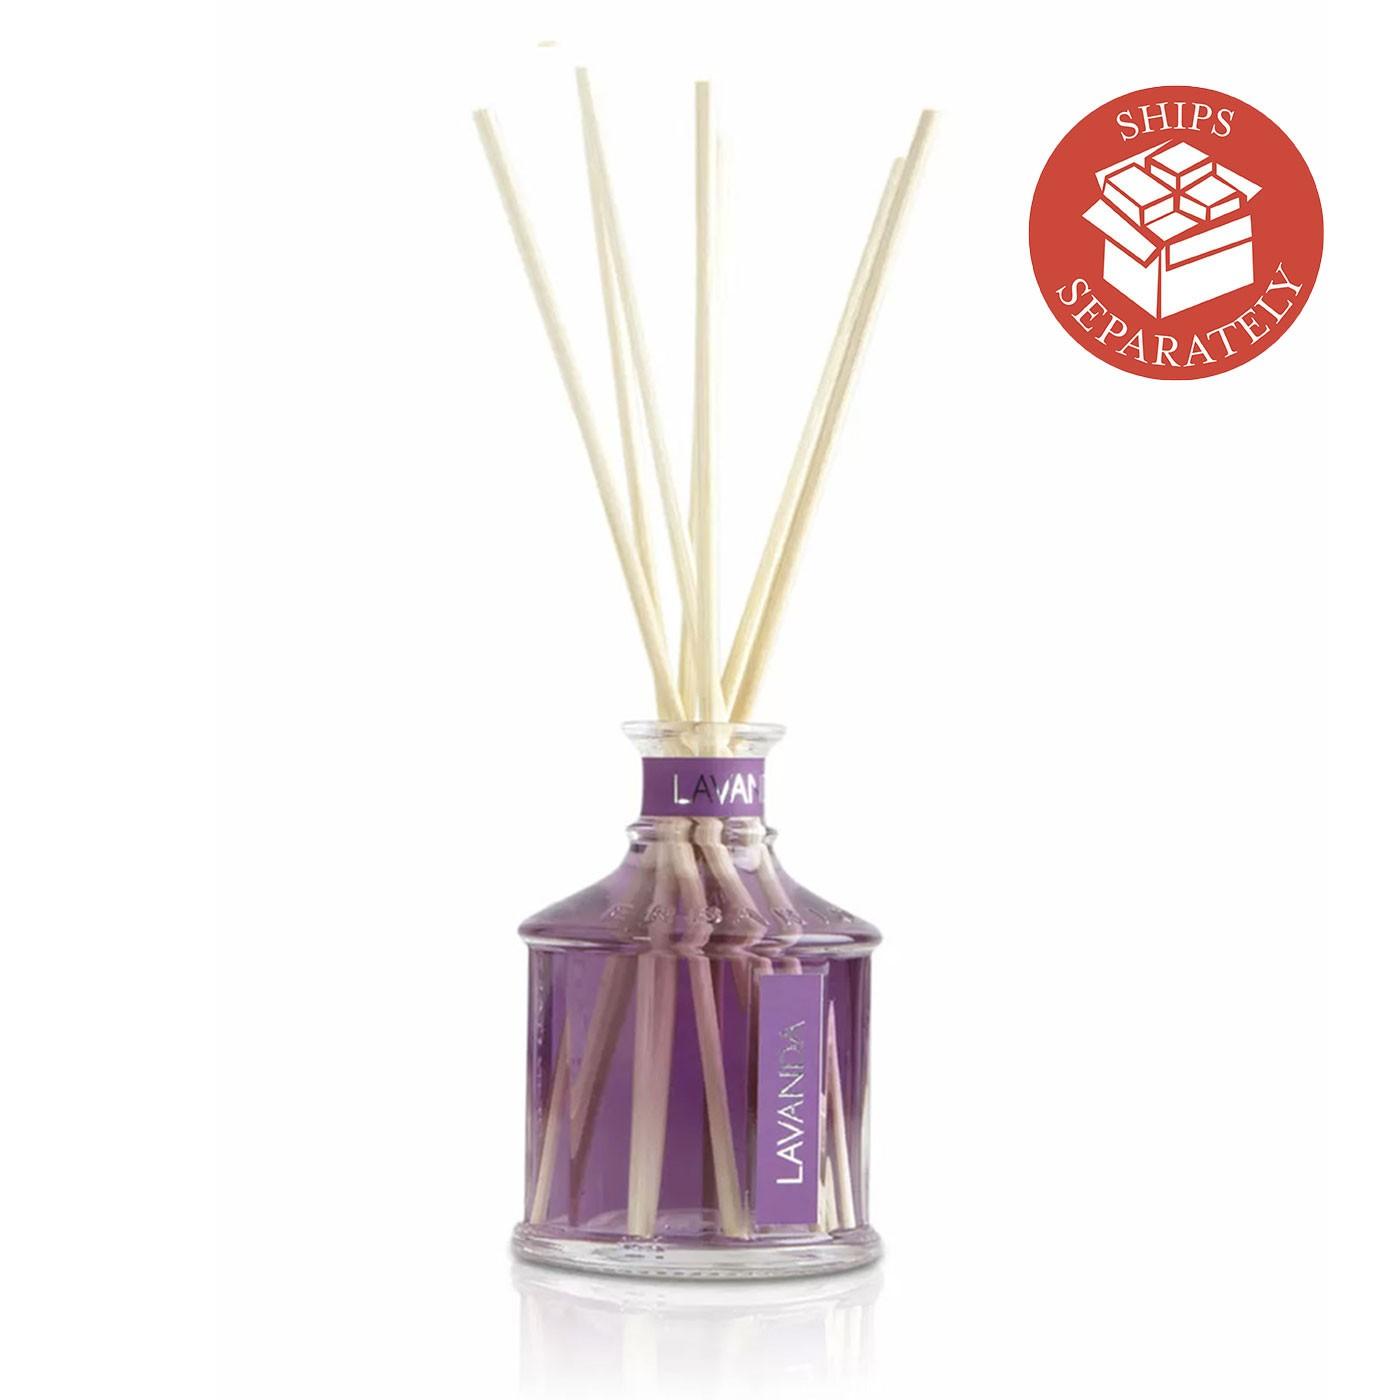 Lavender Fragrance Diffuser 34 oz - Erbario Toscano | Eataly.com